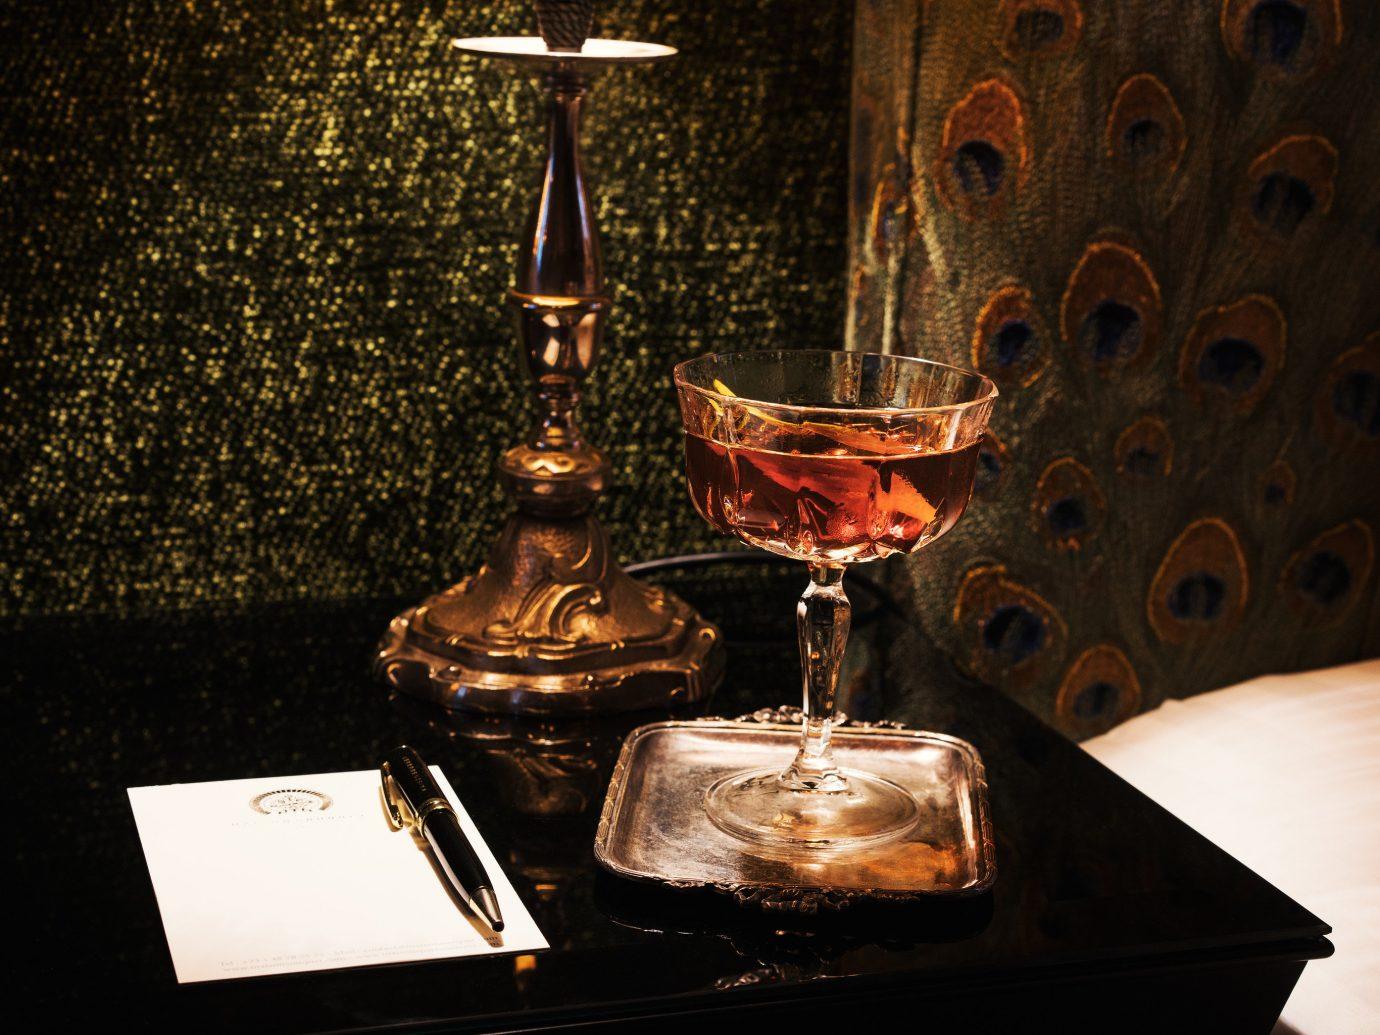 France Hotels Paris table indoor still life photography light darkness lighting glass Drink still life distilled beverage